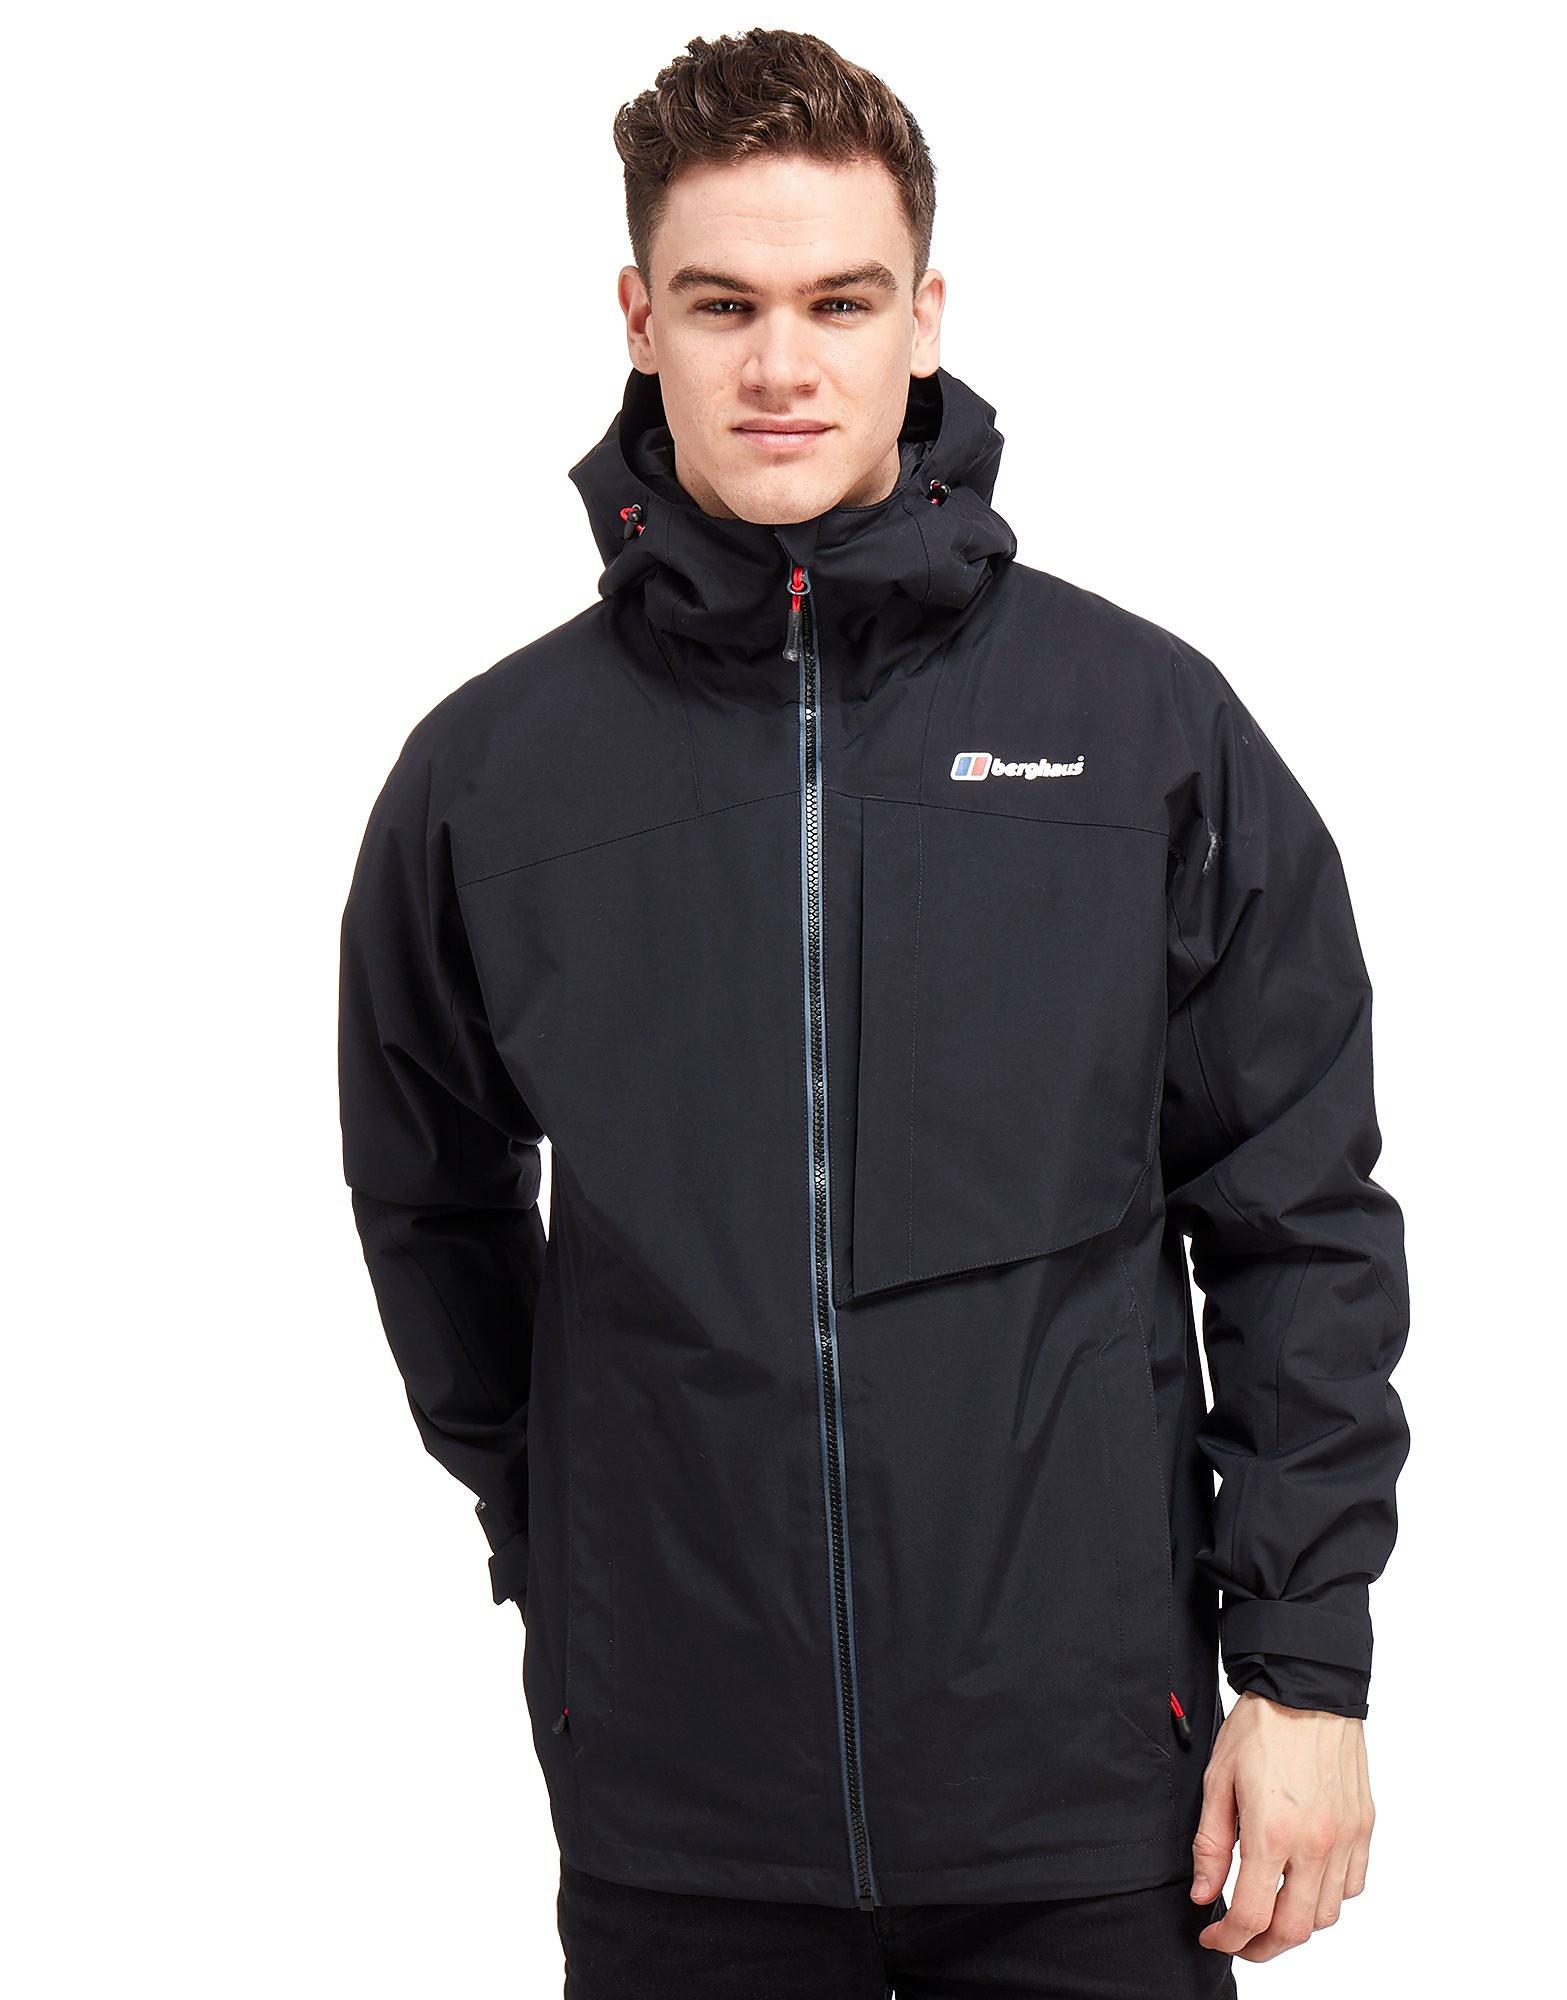 Berghaus Ben Alder 3-In-1 Jacket